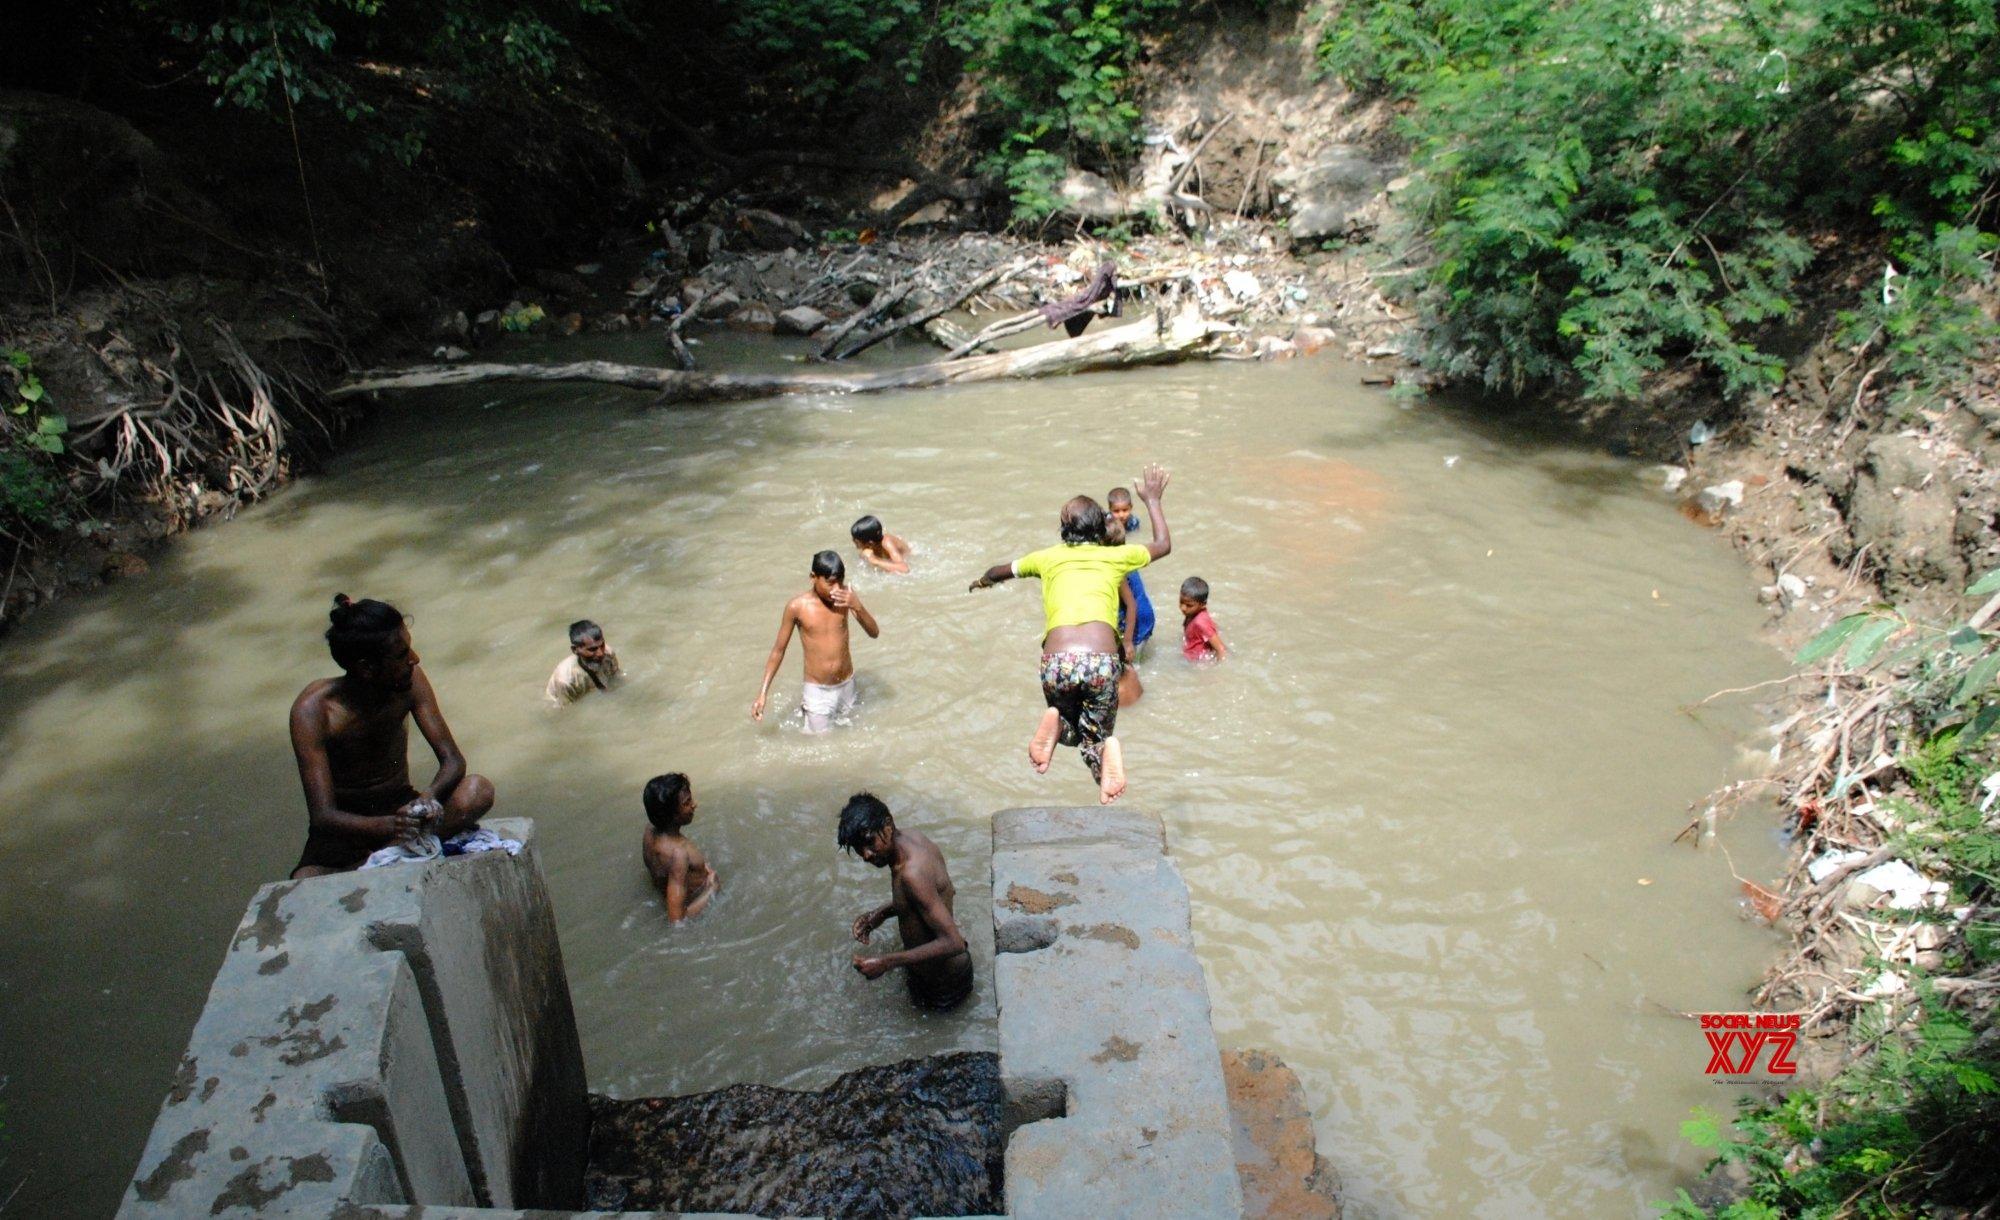 New Delhi: Children enjoying in water pond during hot weather in New Delhi. #Gallery